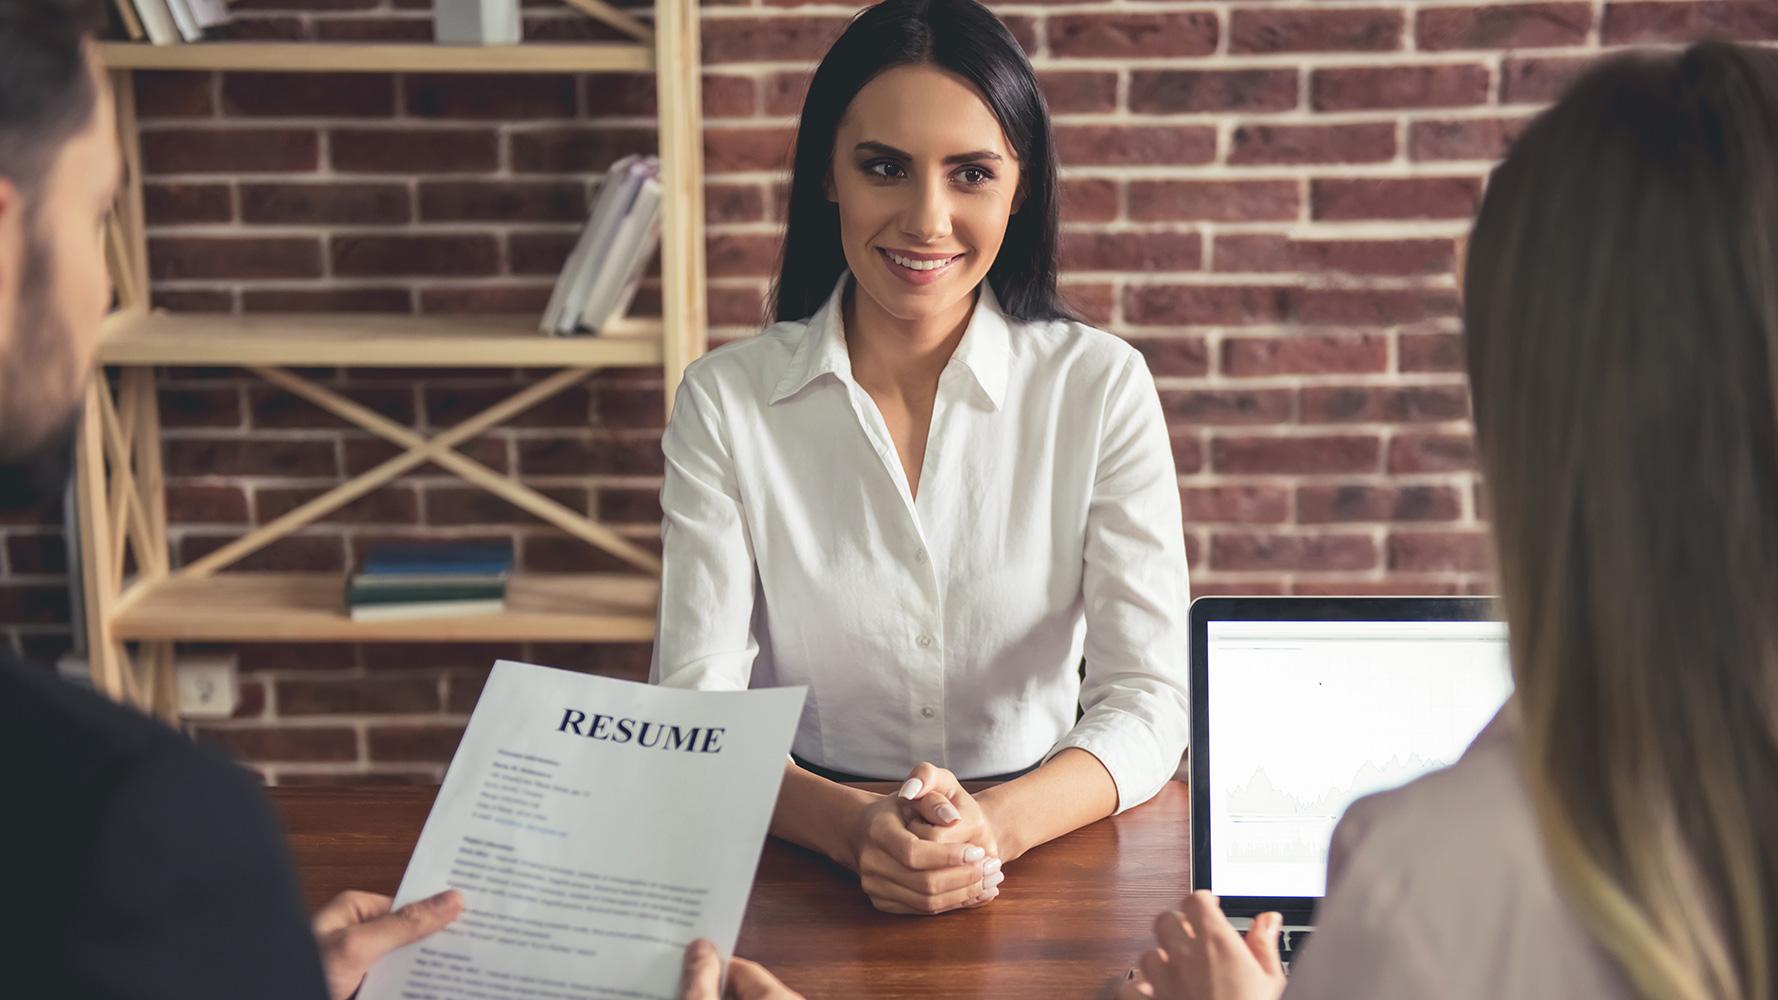 Job Seeker Sharing a Resume